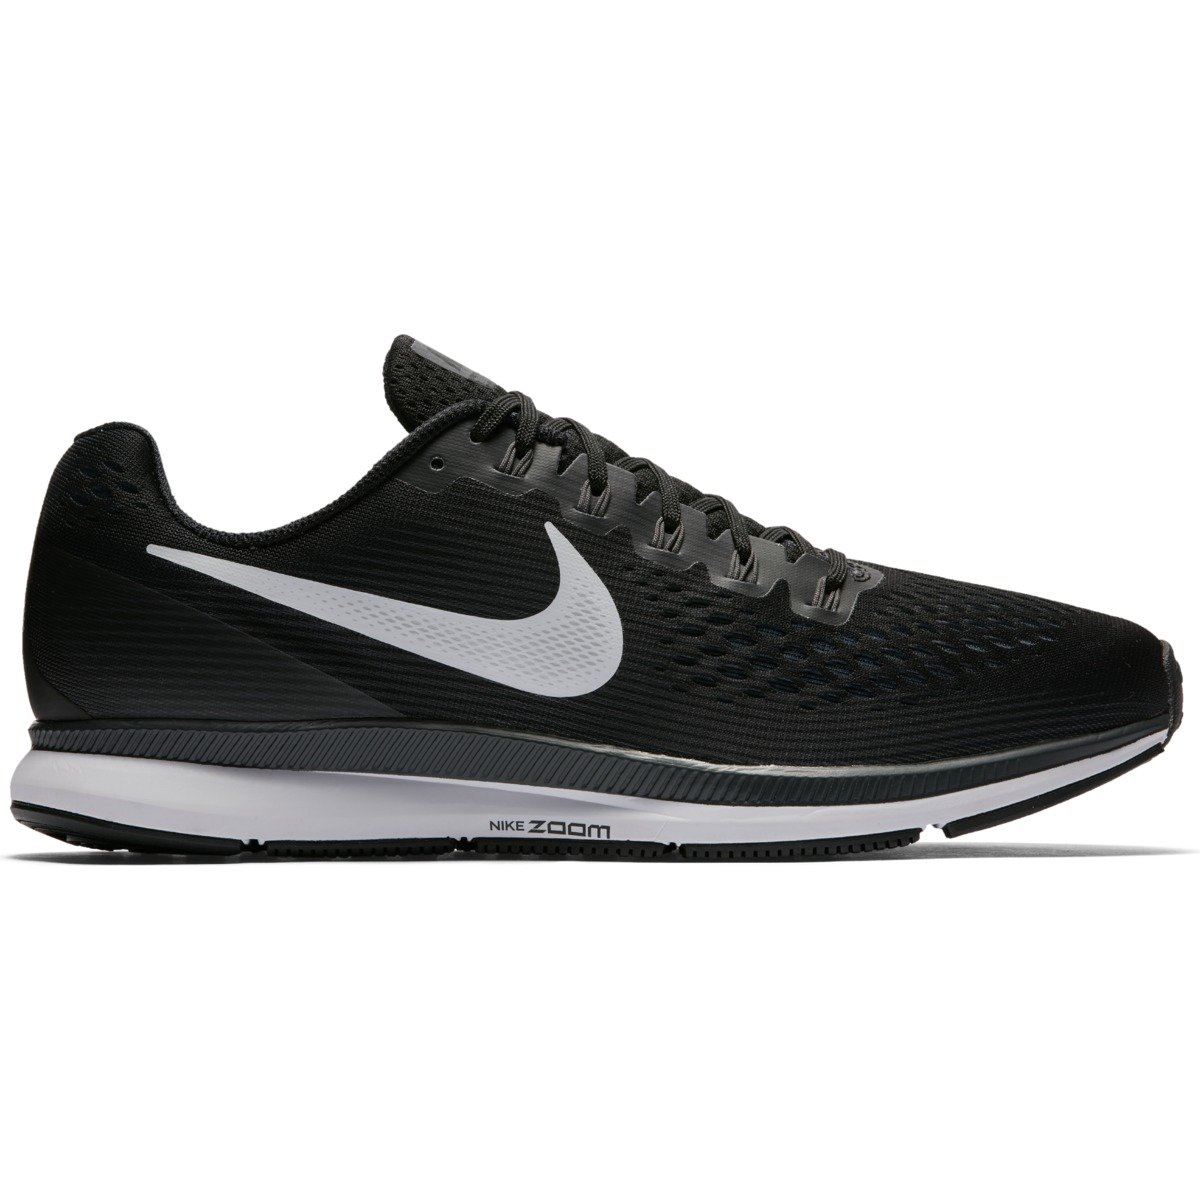 5e9a7954 Nike Air Zoom Pegasus 34 Herre | SportsDeal